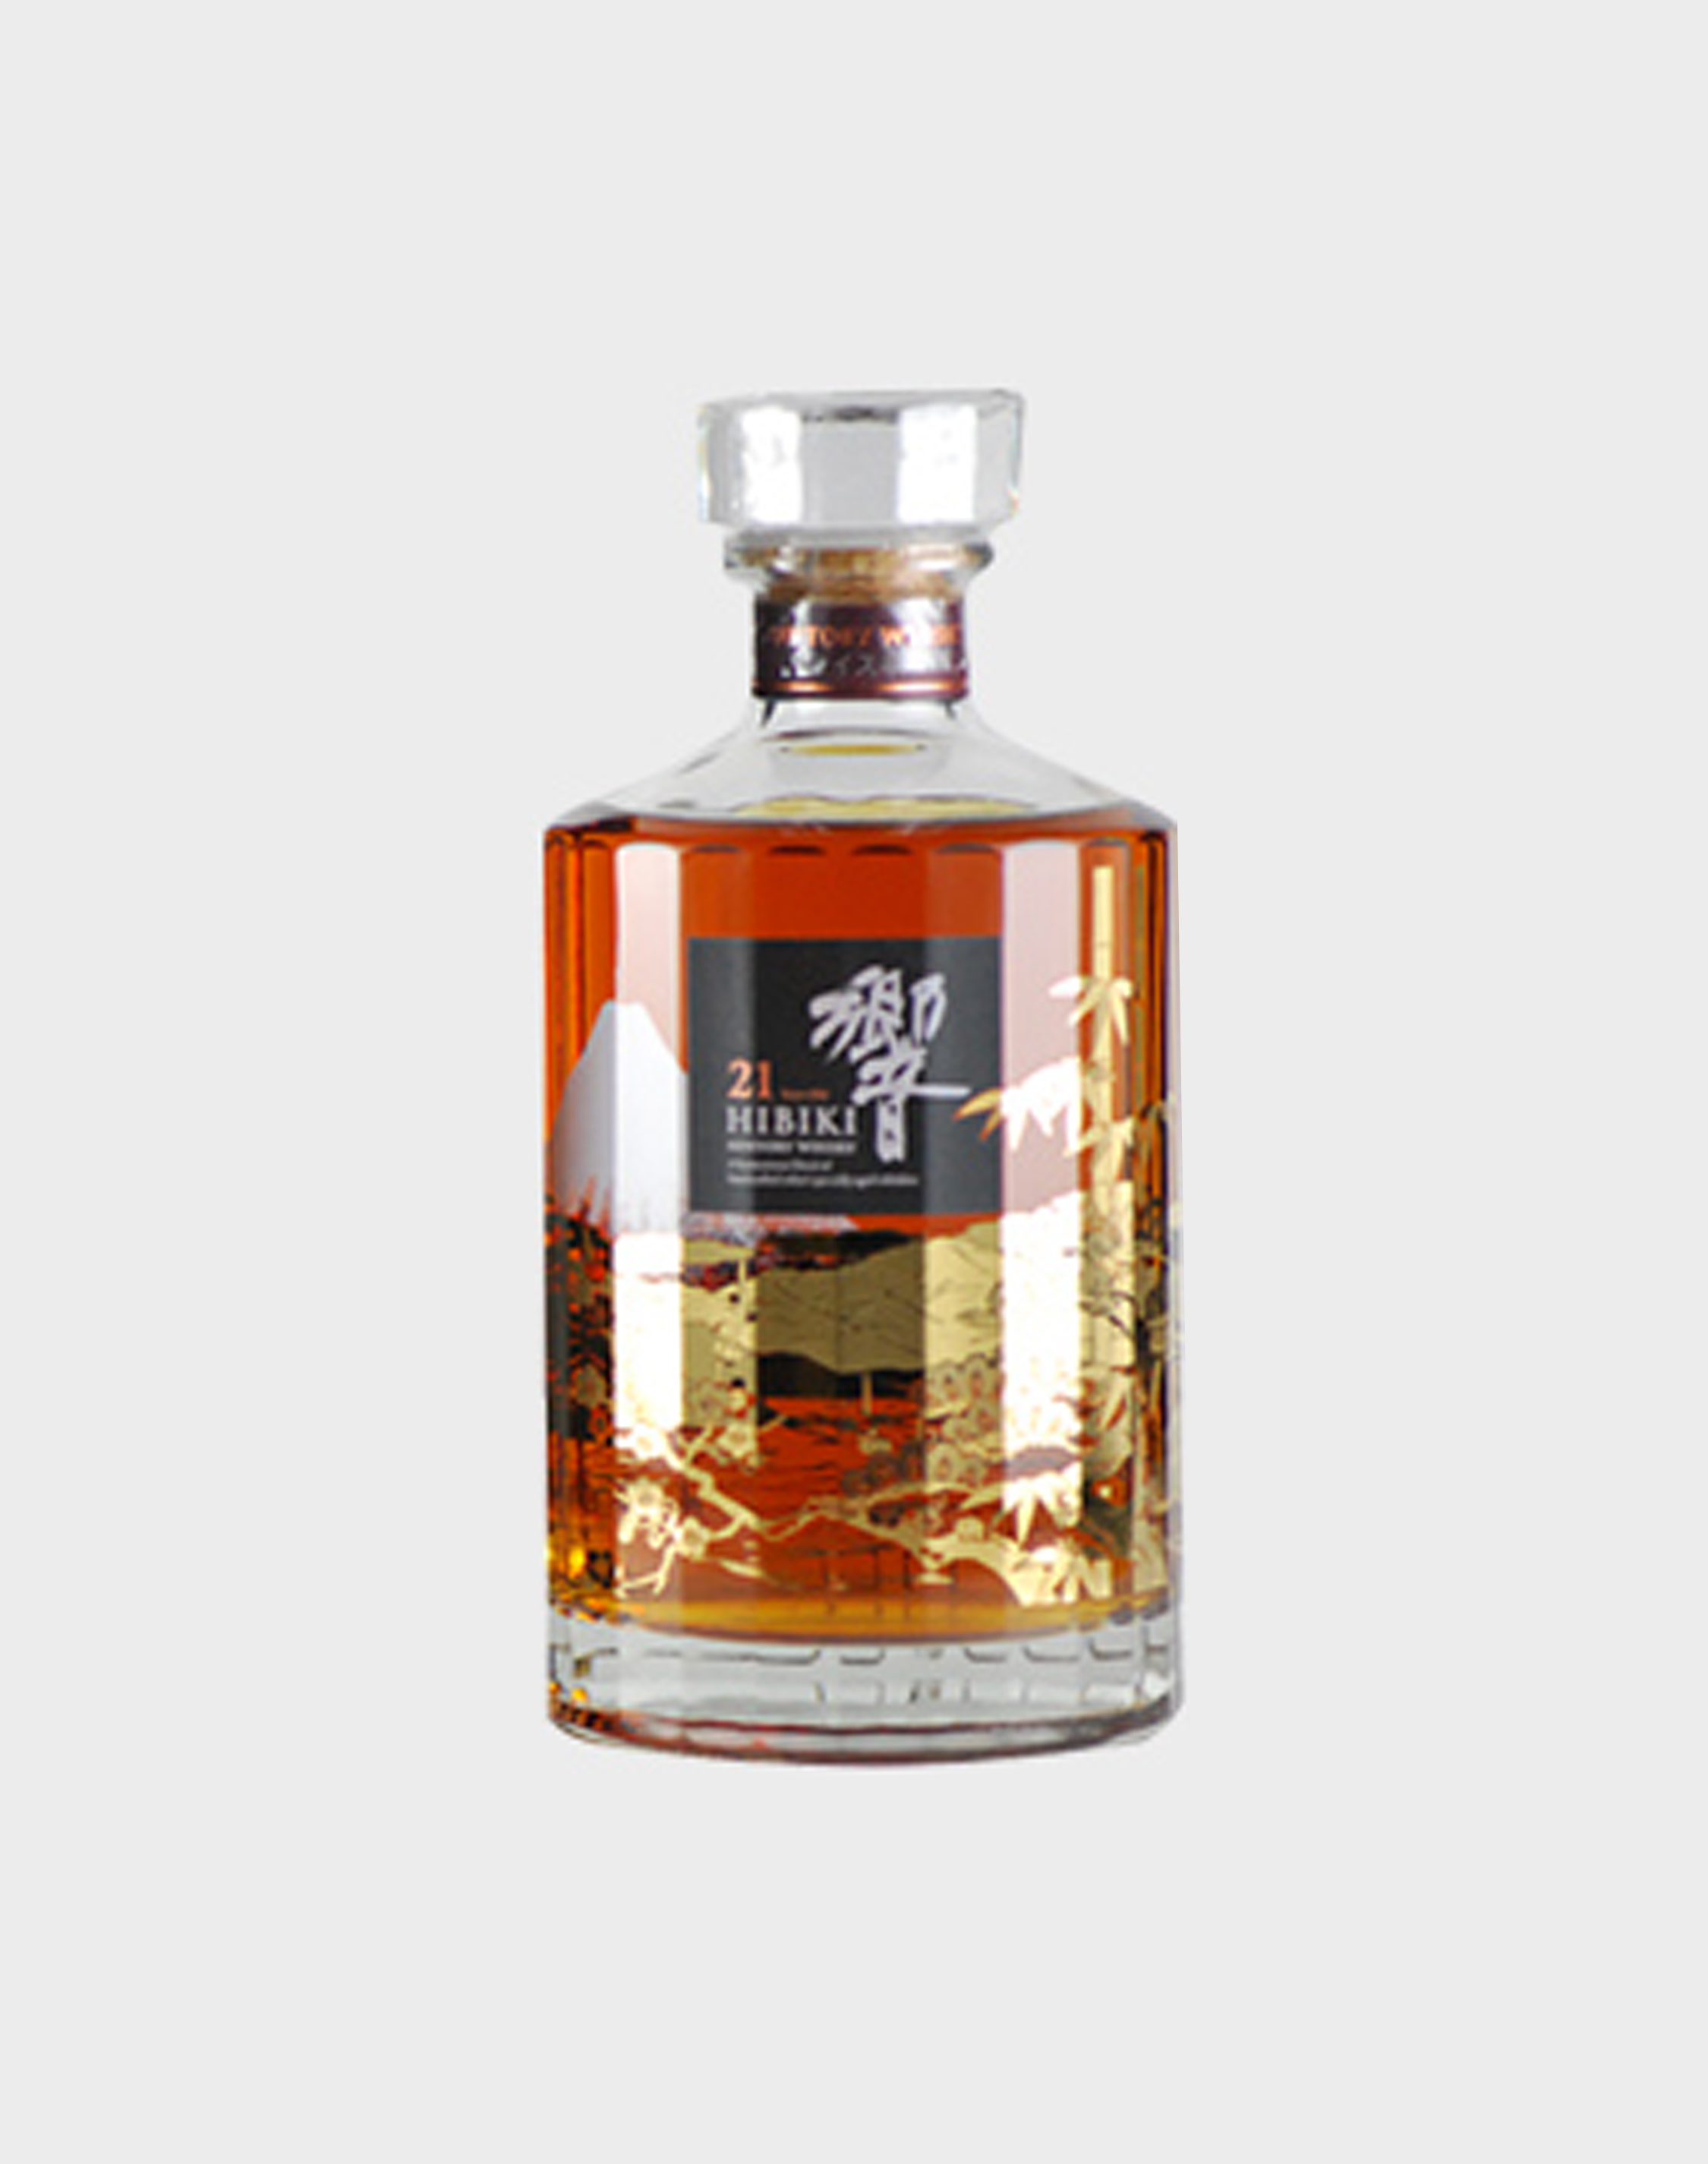 Suntory Hibiki 21 Year Old Whisky Limited Edition Duty